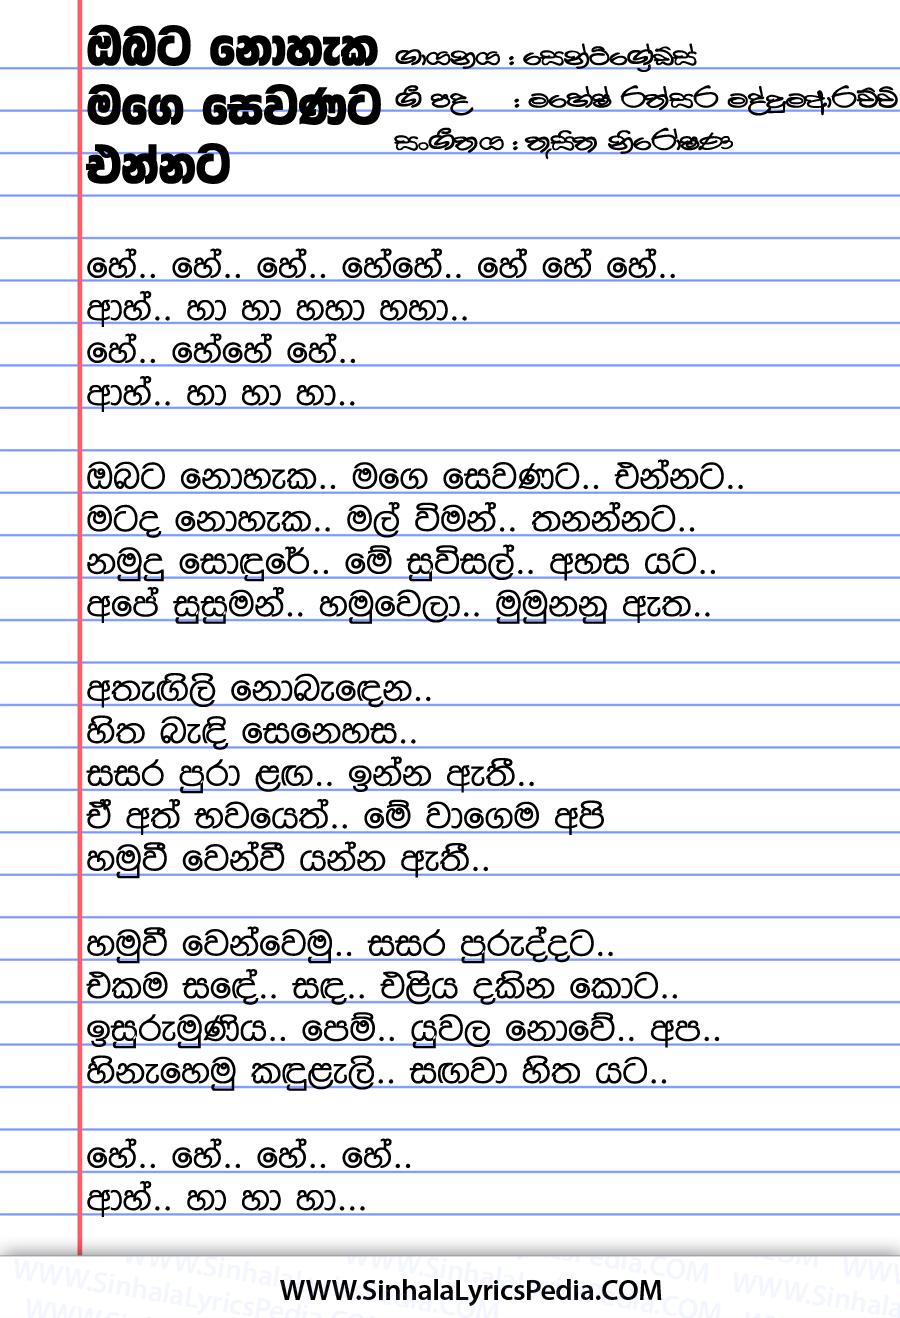 Obata Nohaka Mage Sewanata (Mal Dewata) Song Lyrics